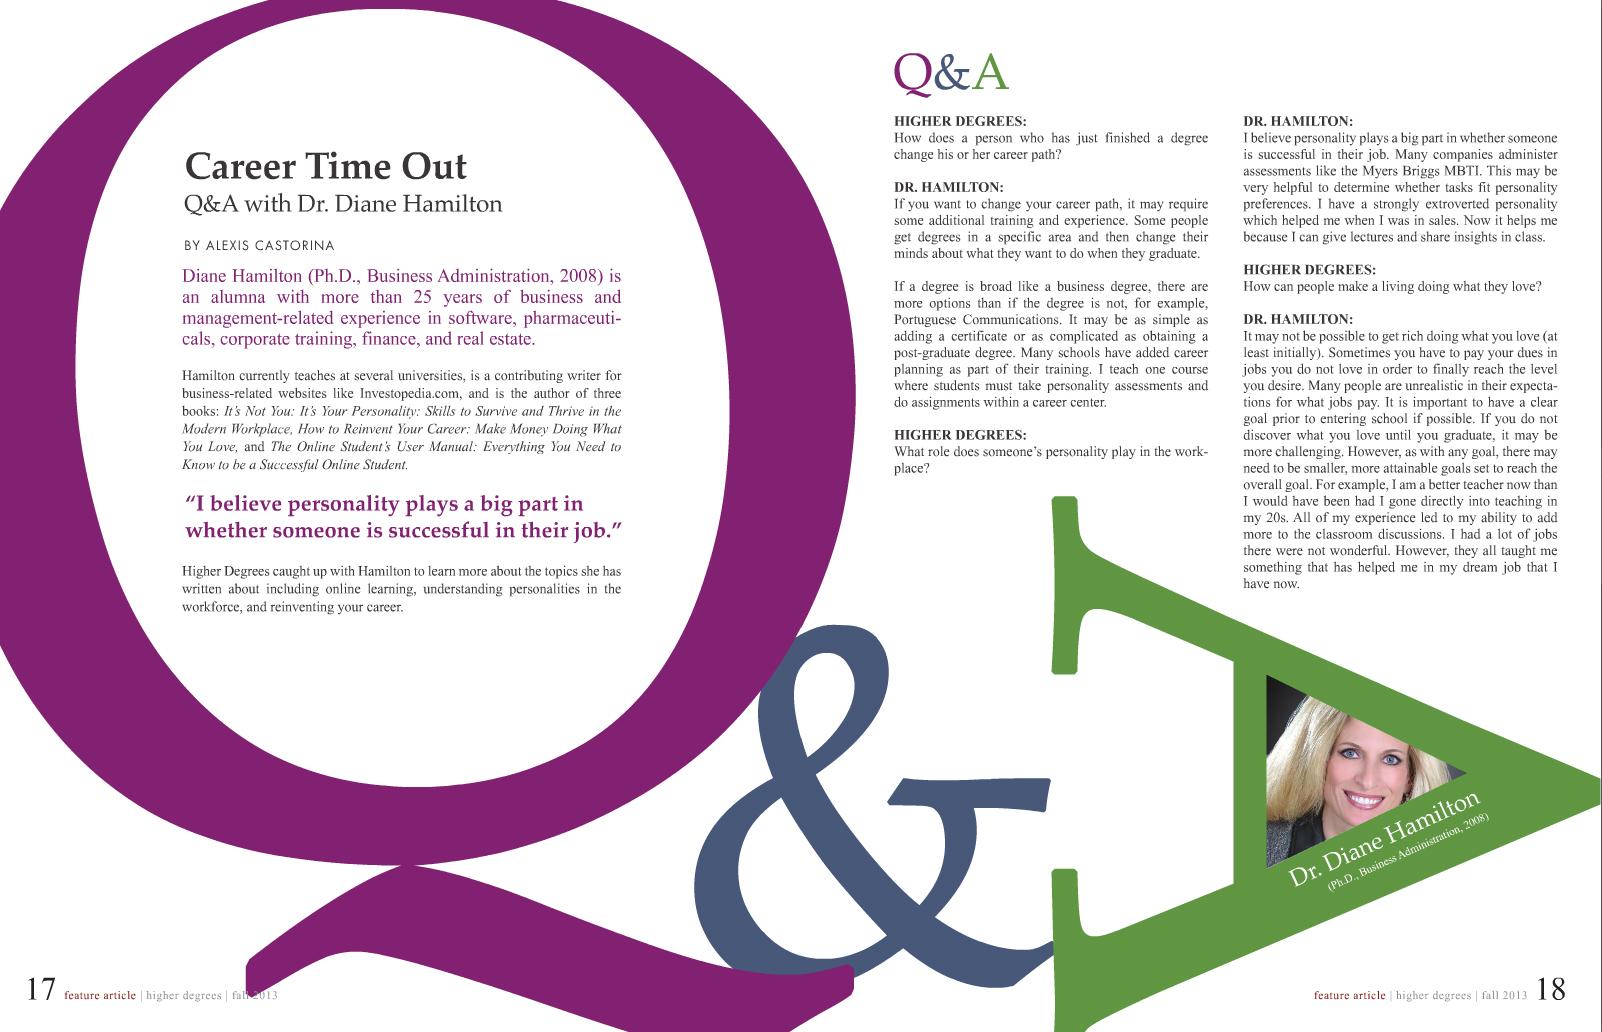 NCU Interviews Dr. Diane Hamilton